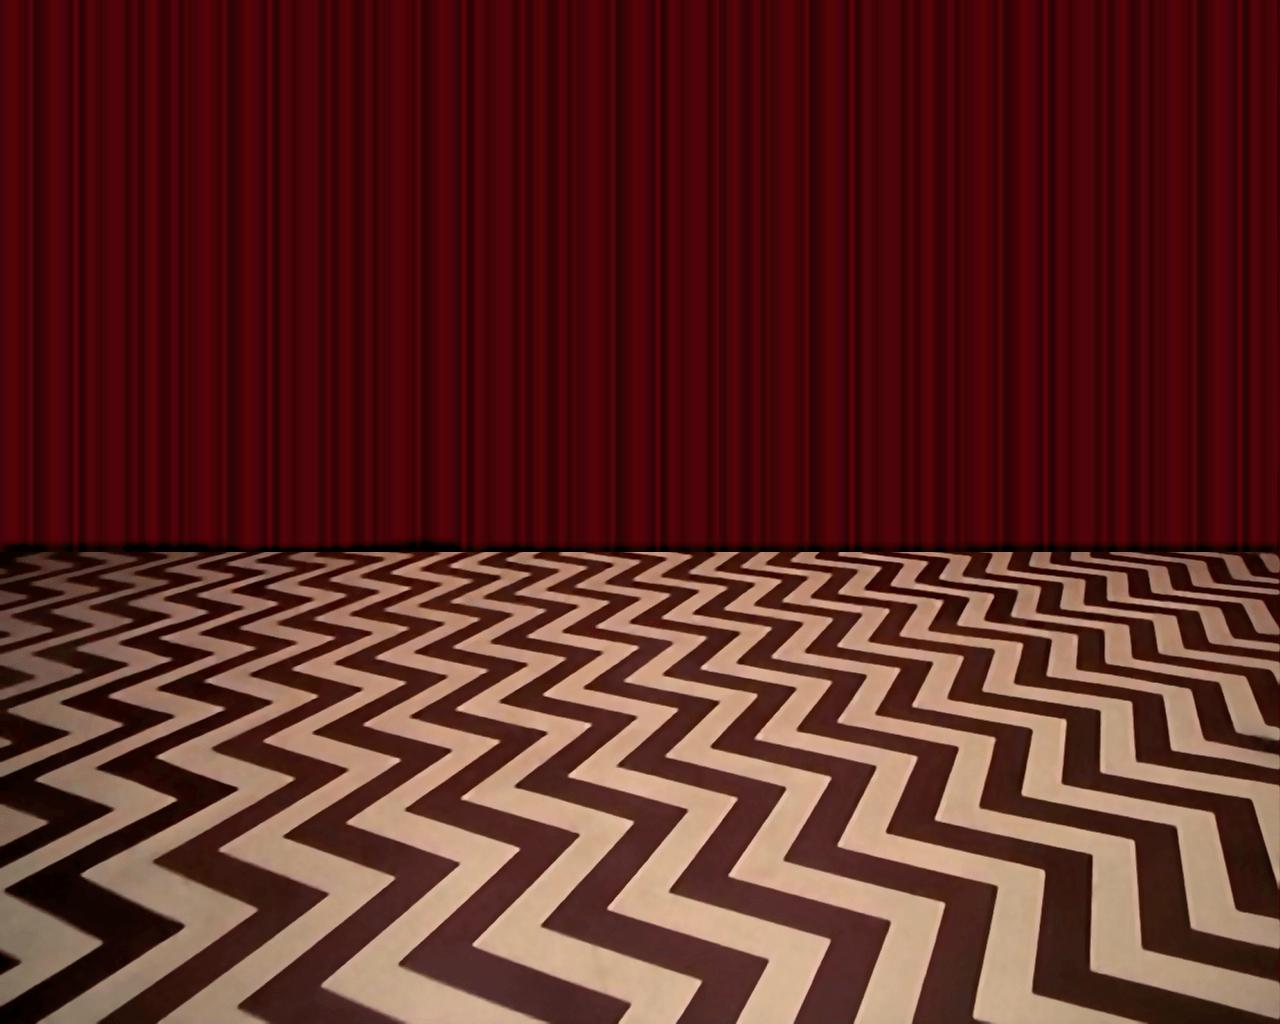 Twin Peaks Wallpapers - Wallpaper Cave